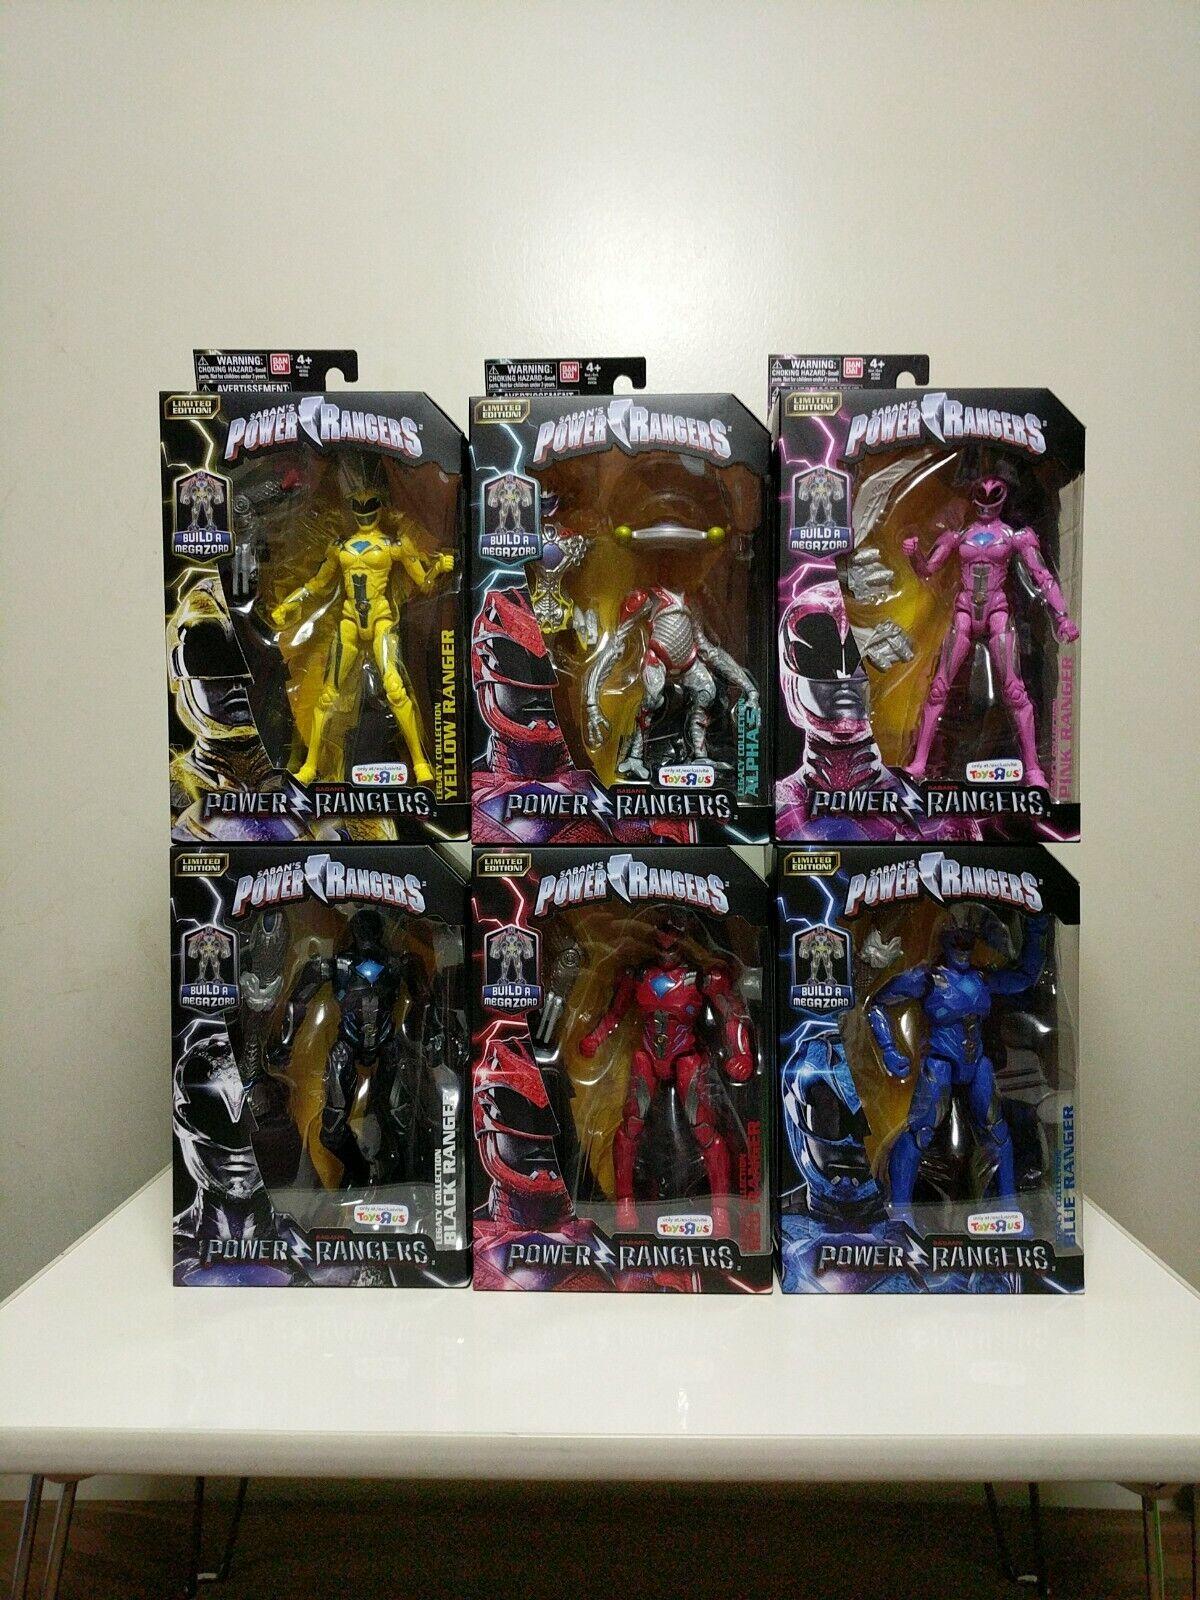 2017 Power Rangers Movie Figure set